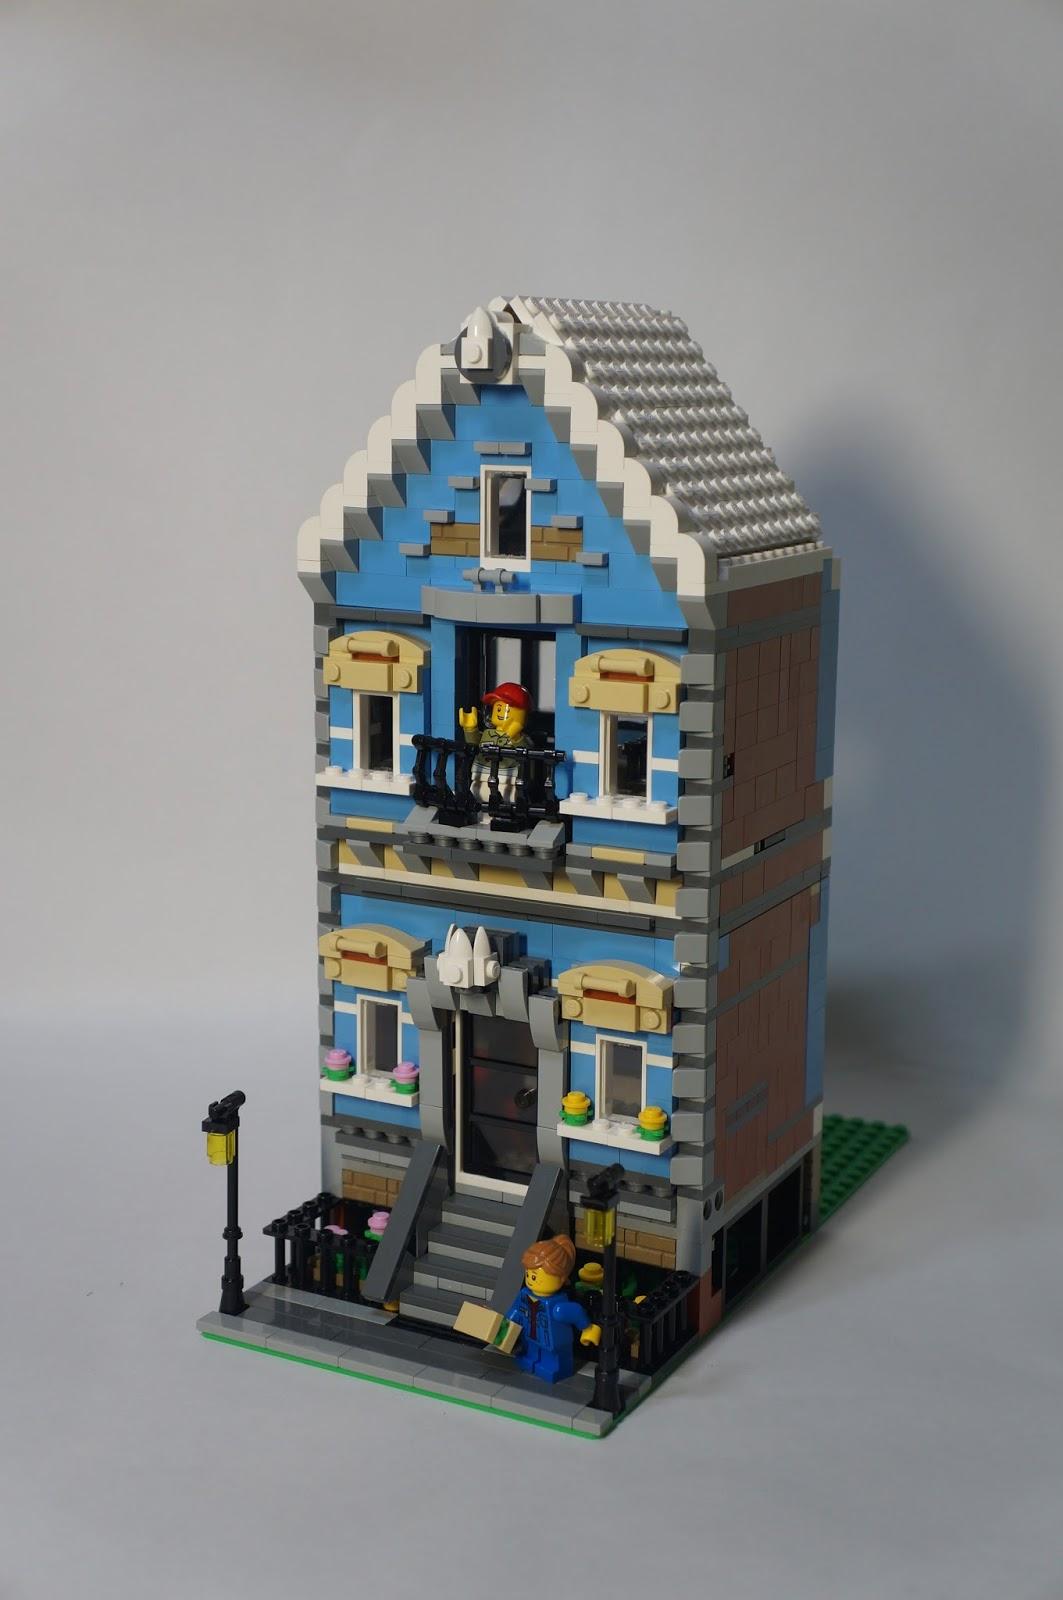 Dicebrick Lego Custom Design Instruction